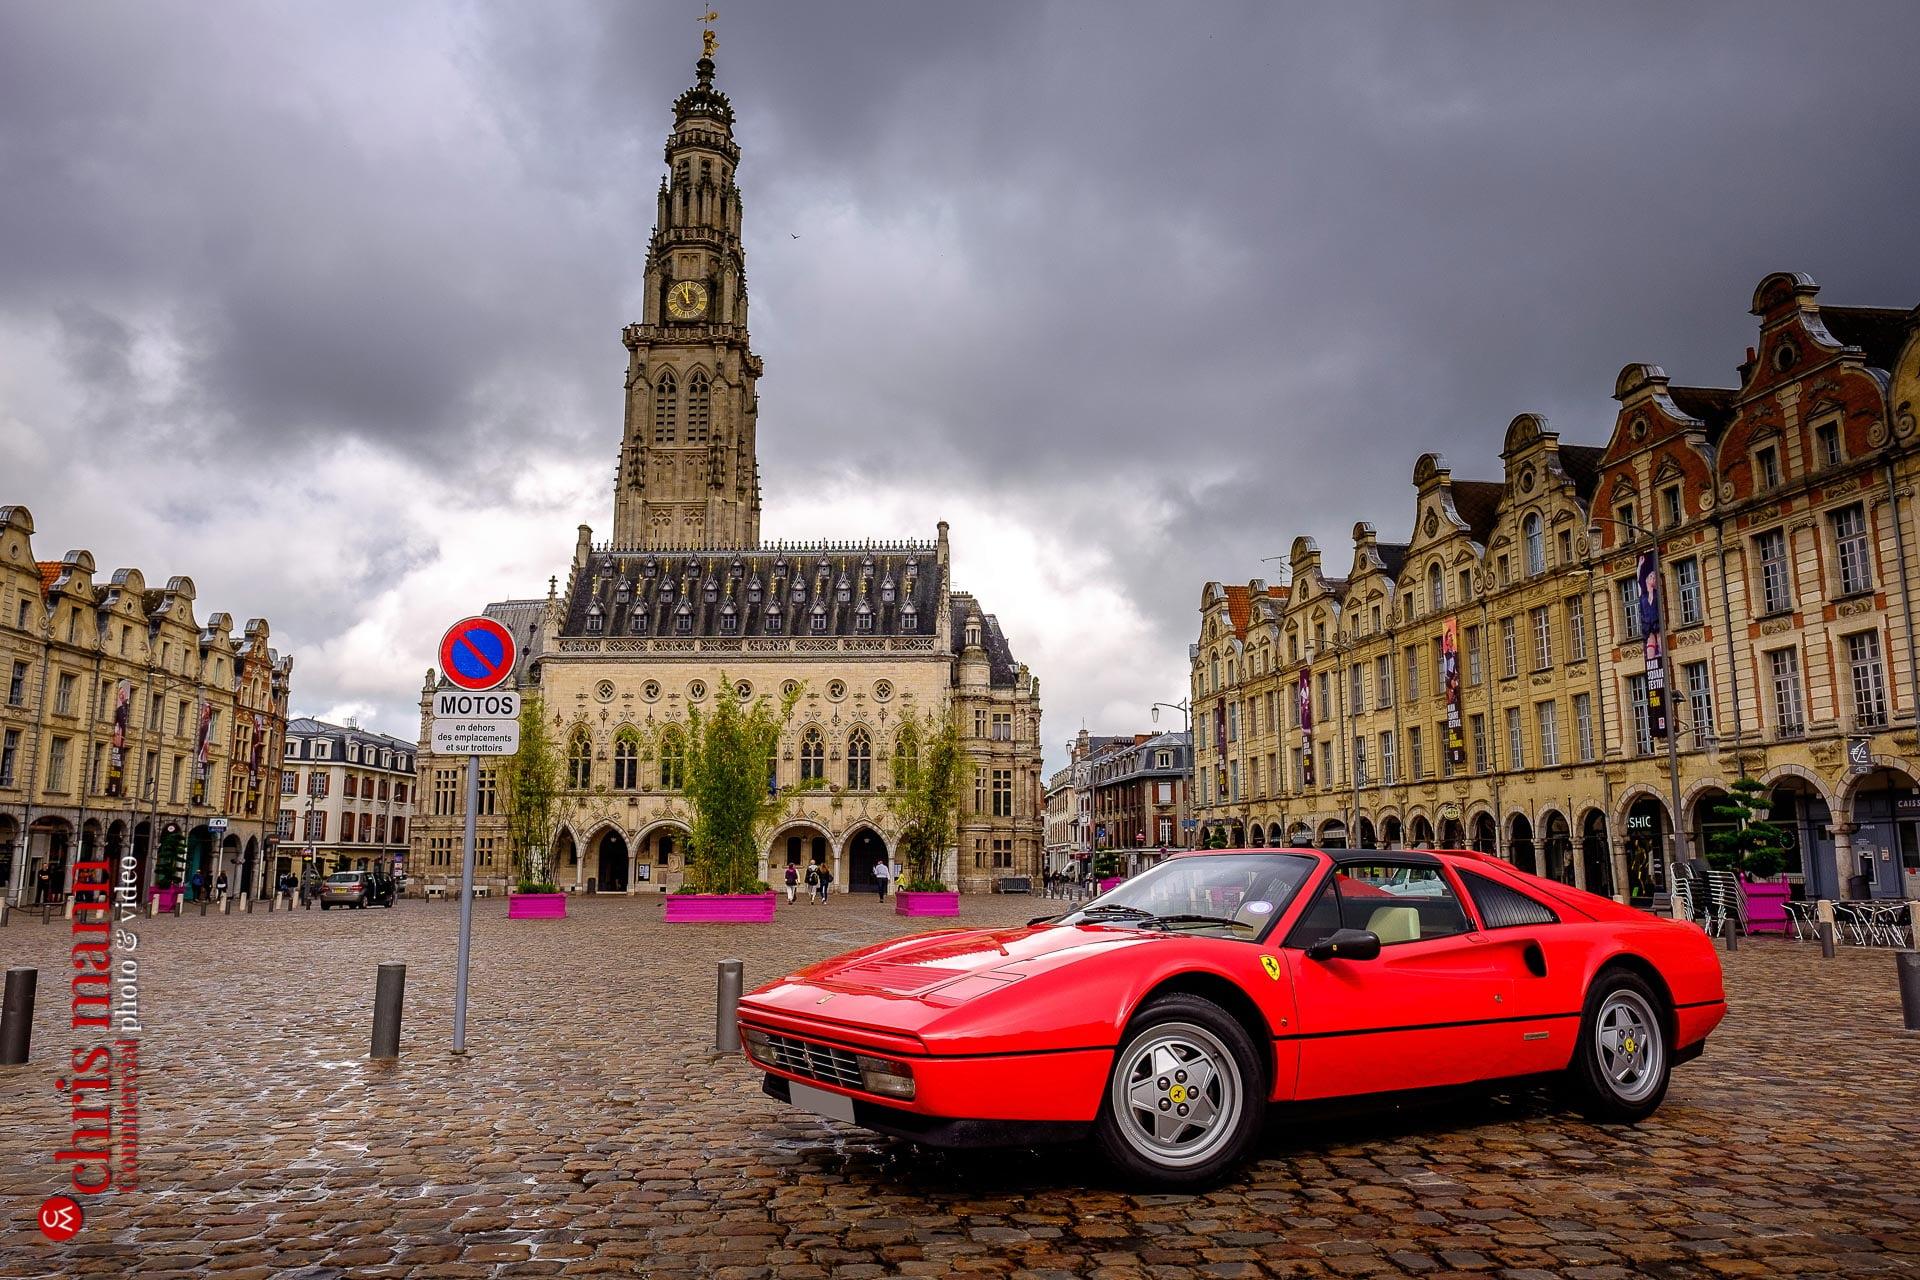 Ferrari 328 GTS Targa Place des Héros Arras France